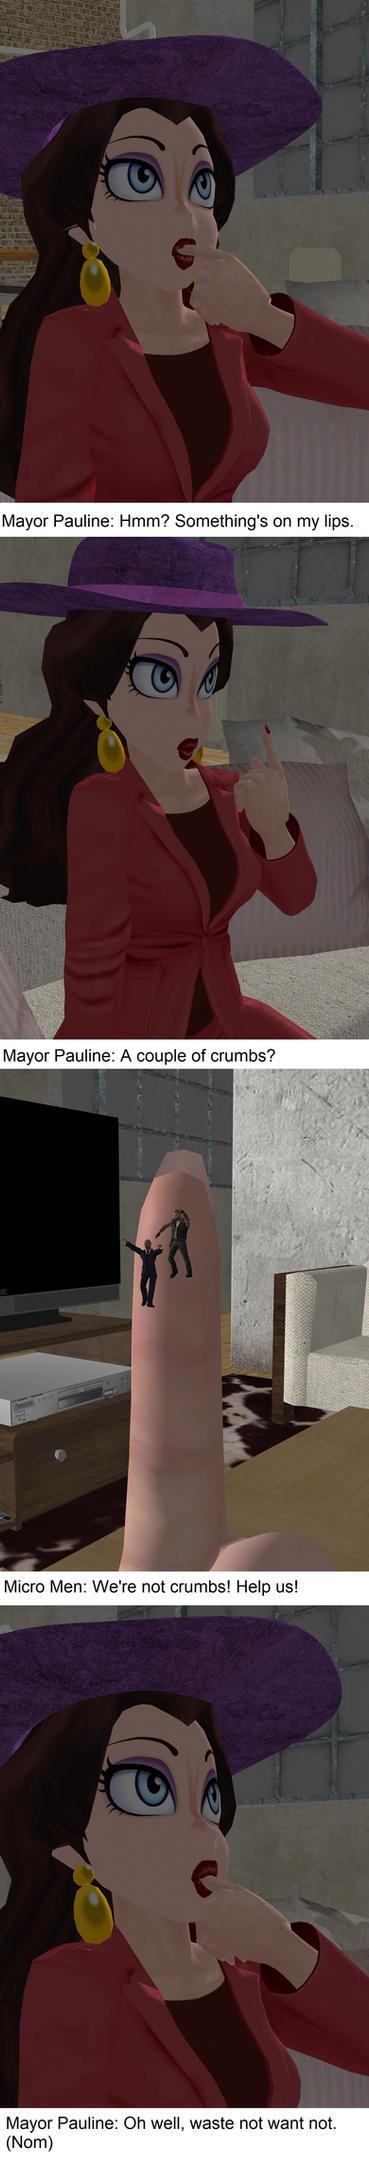 Mayor Pauline GTS Pt 4 by roodedude